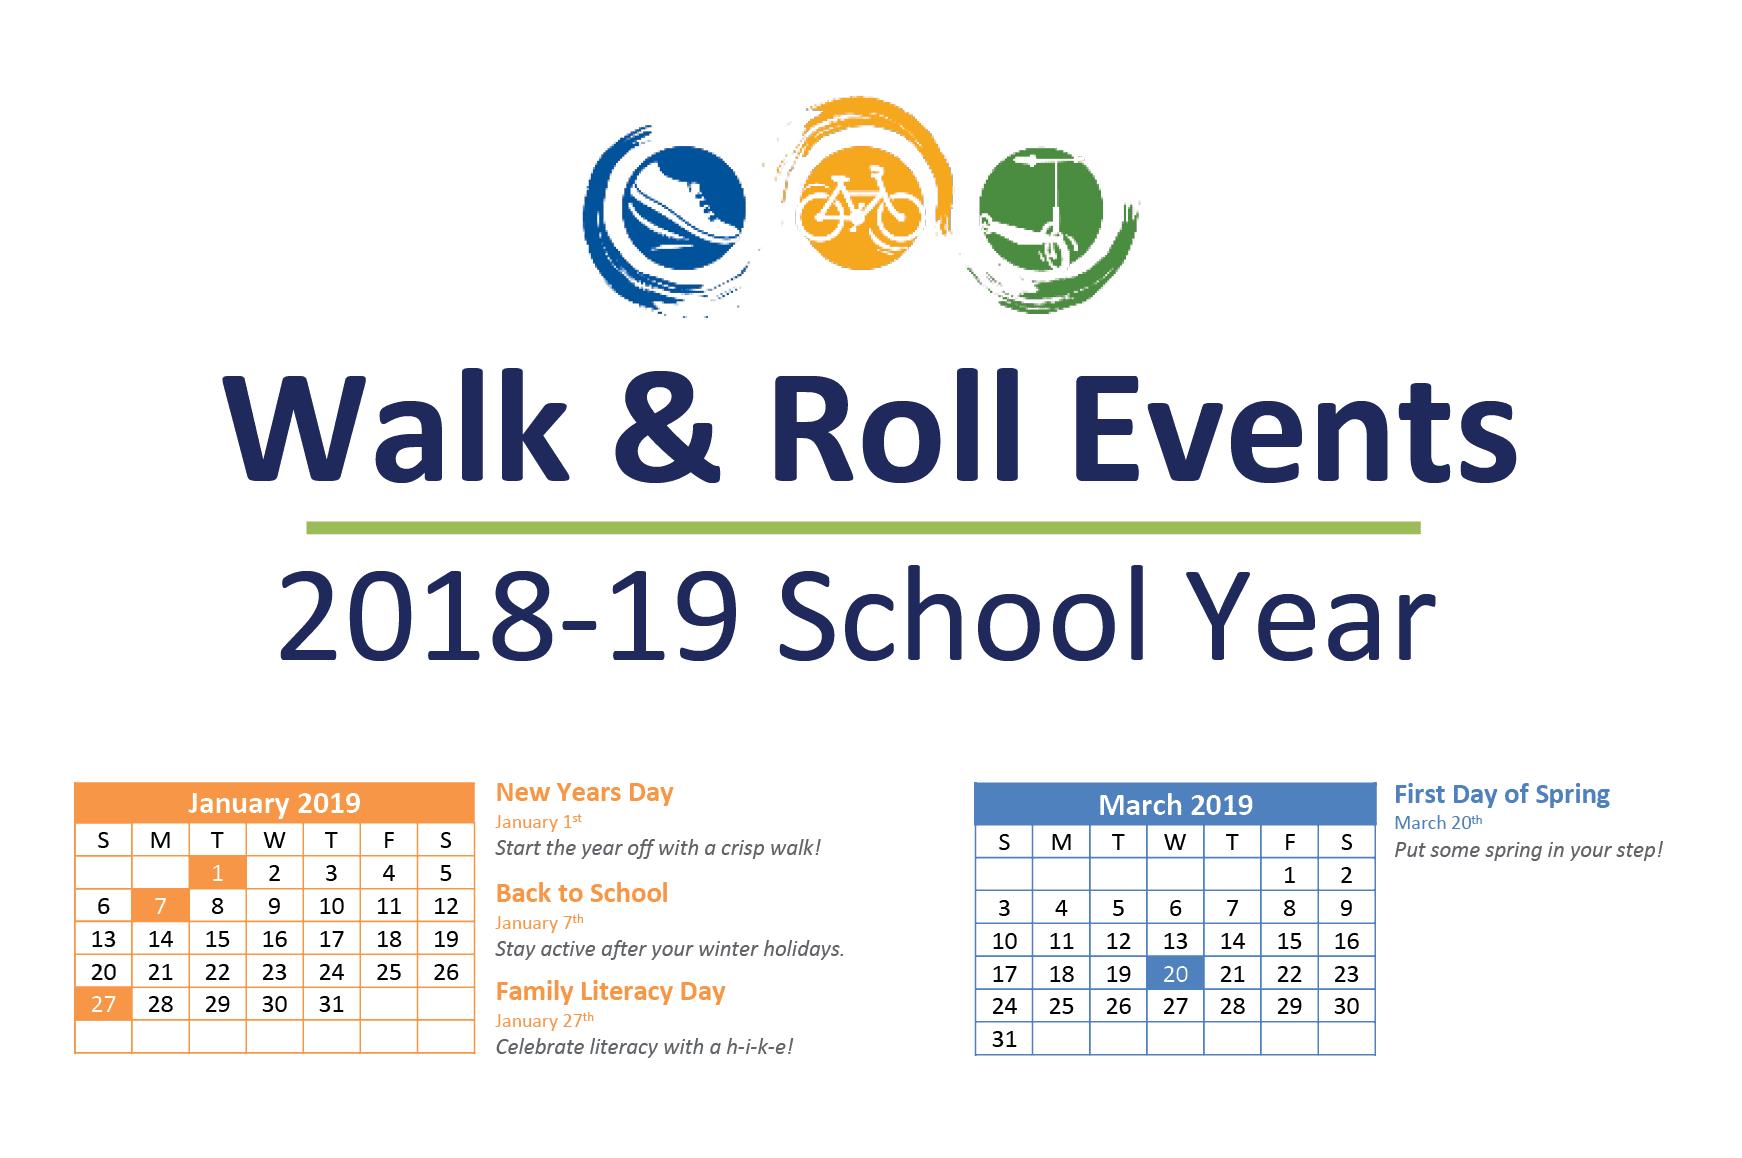 Walk & Roll Events 2018-19